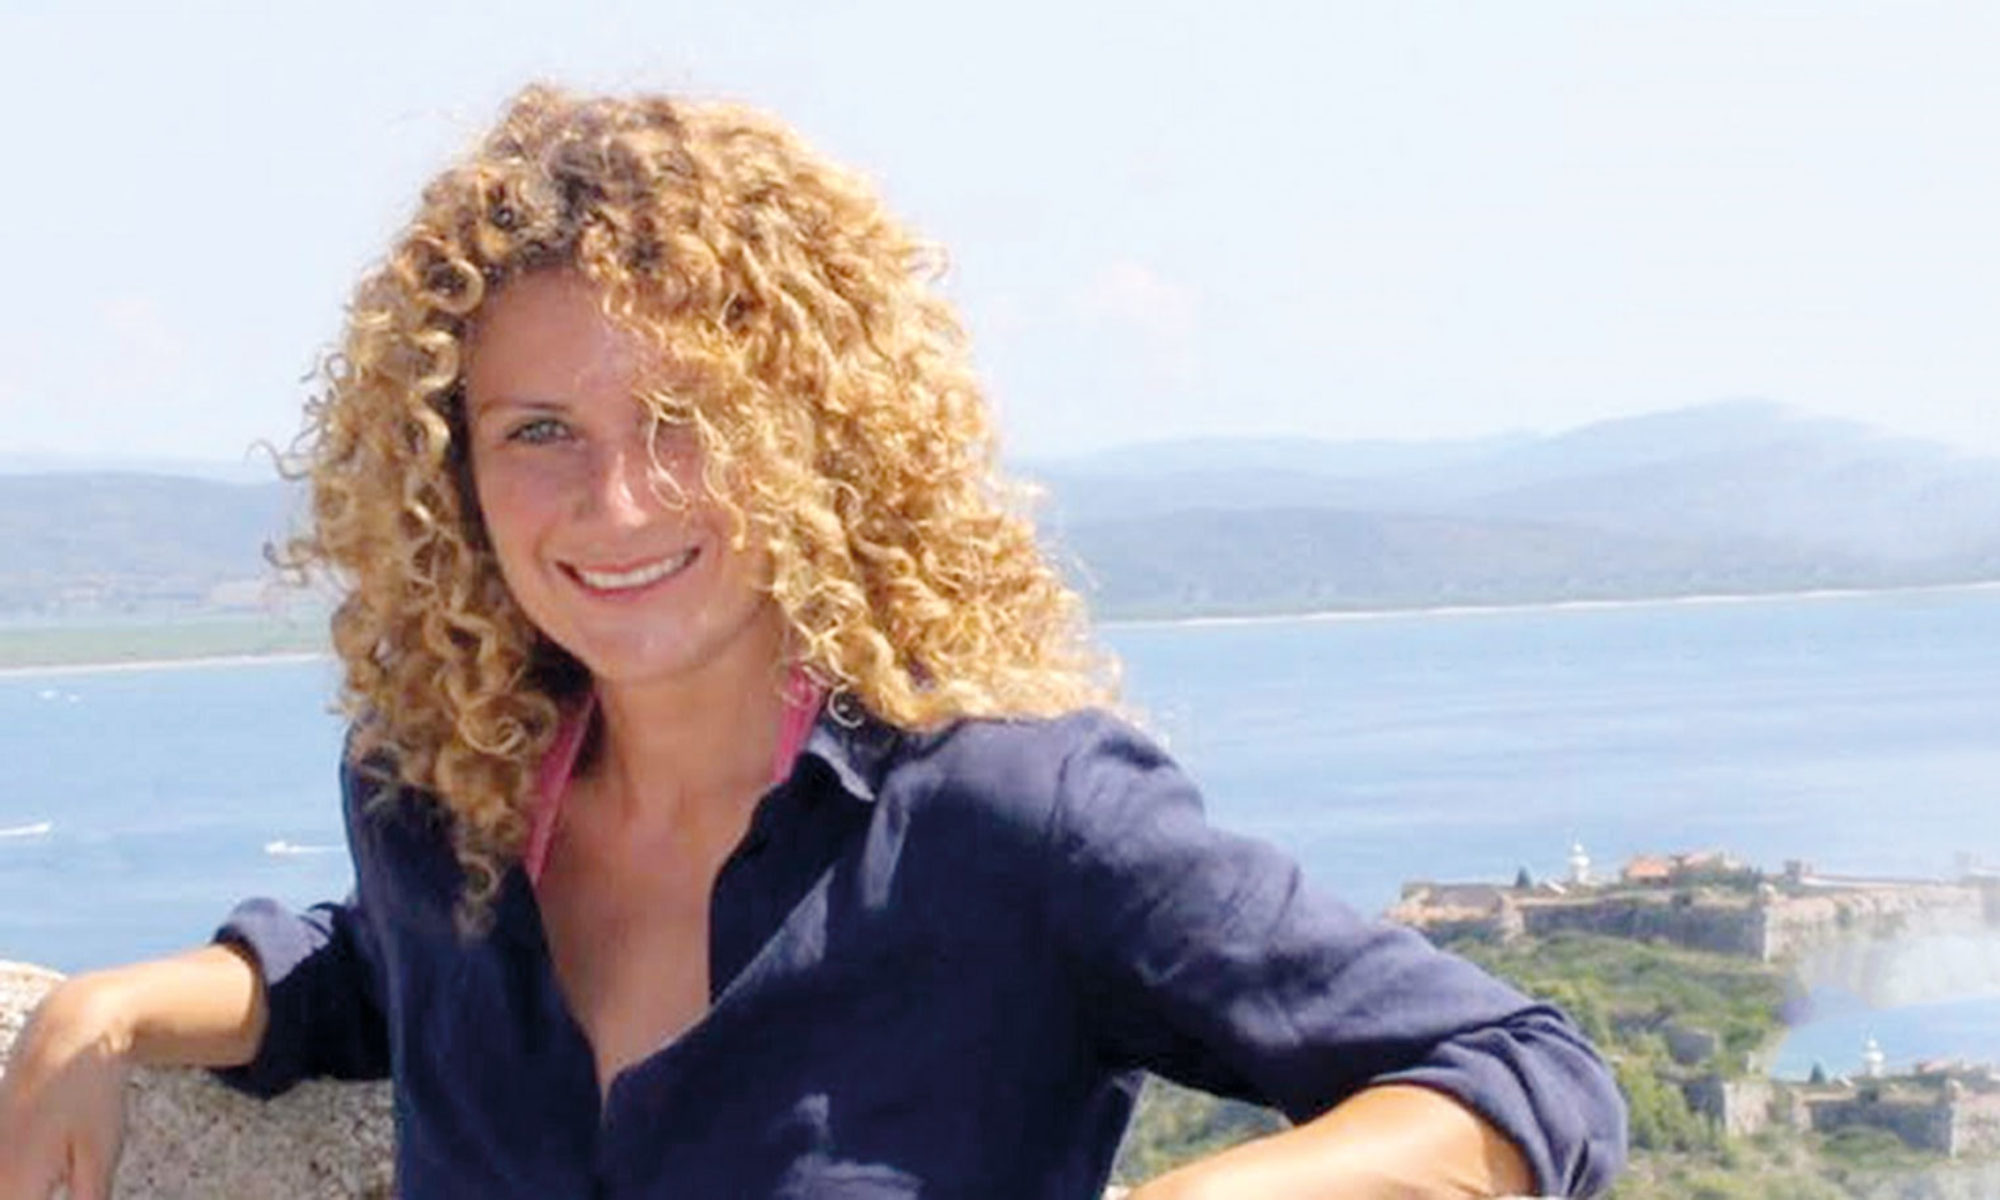 Associazione Veronica Gaia di Orio ONLUS